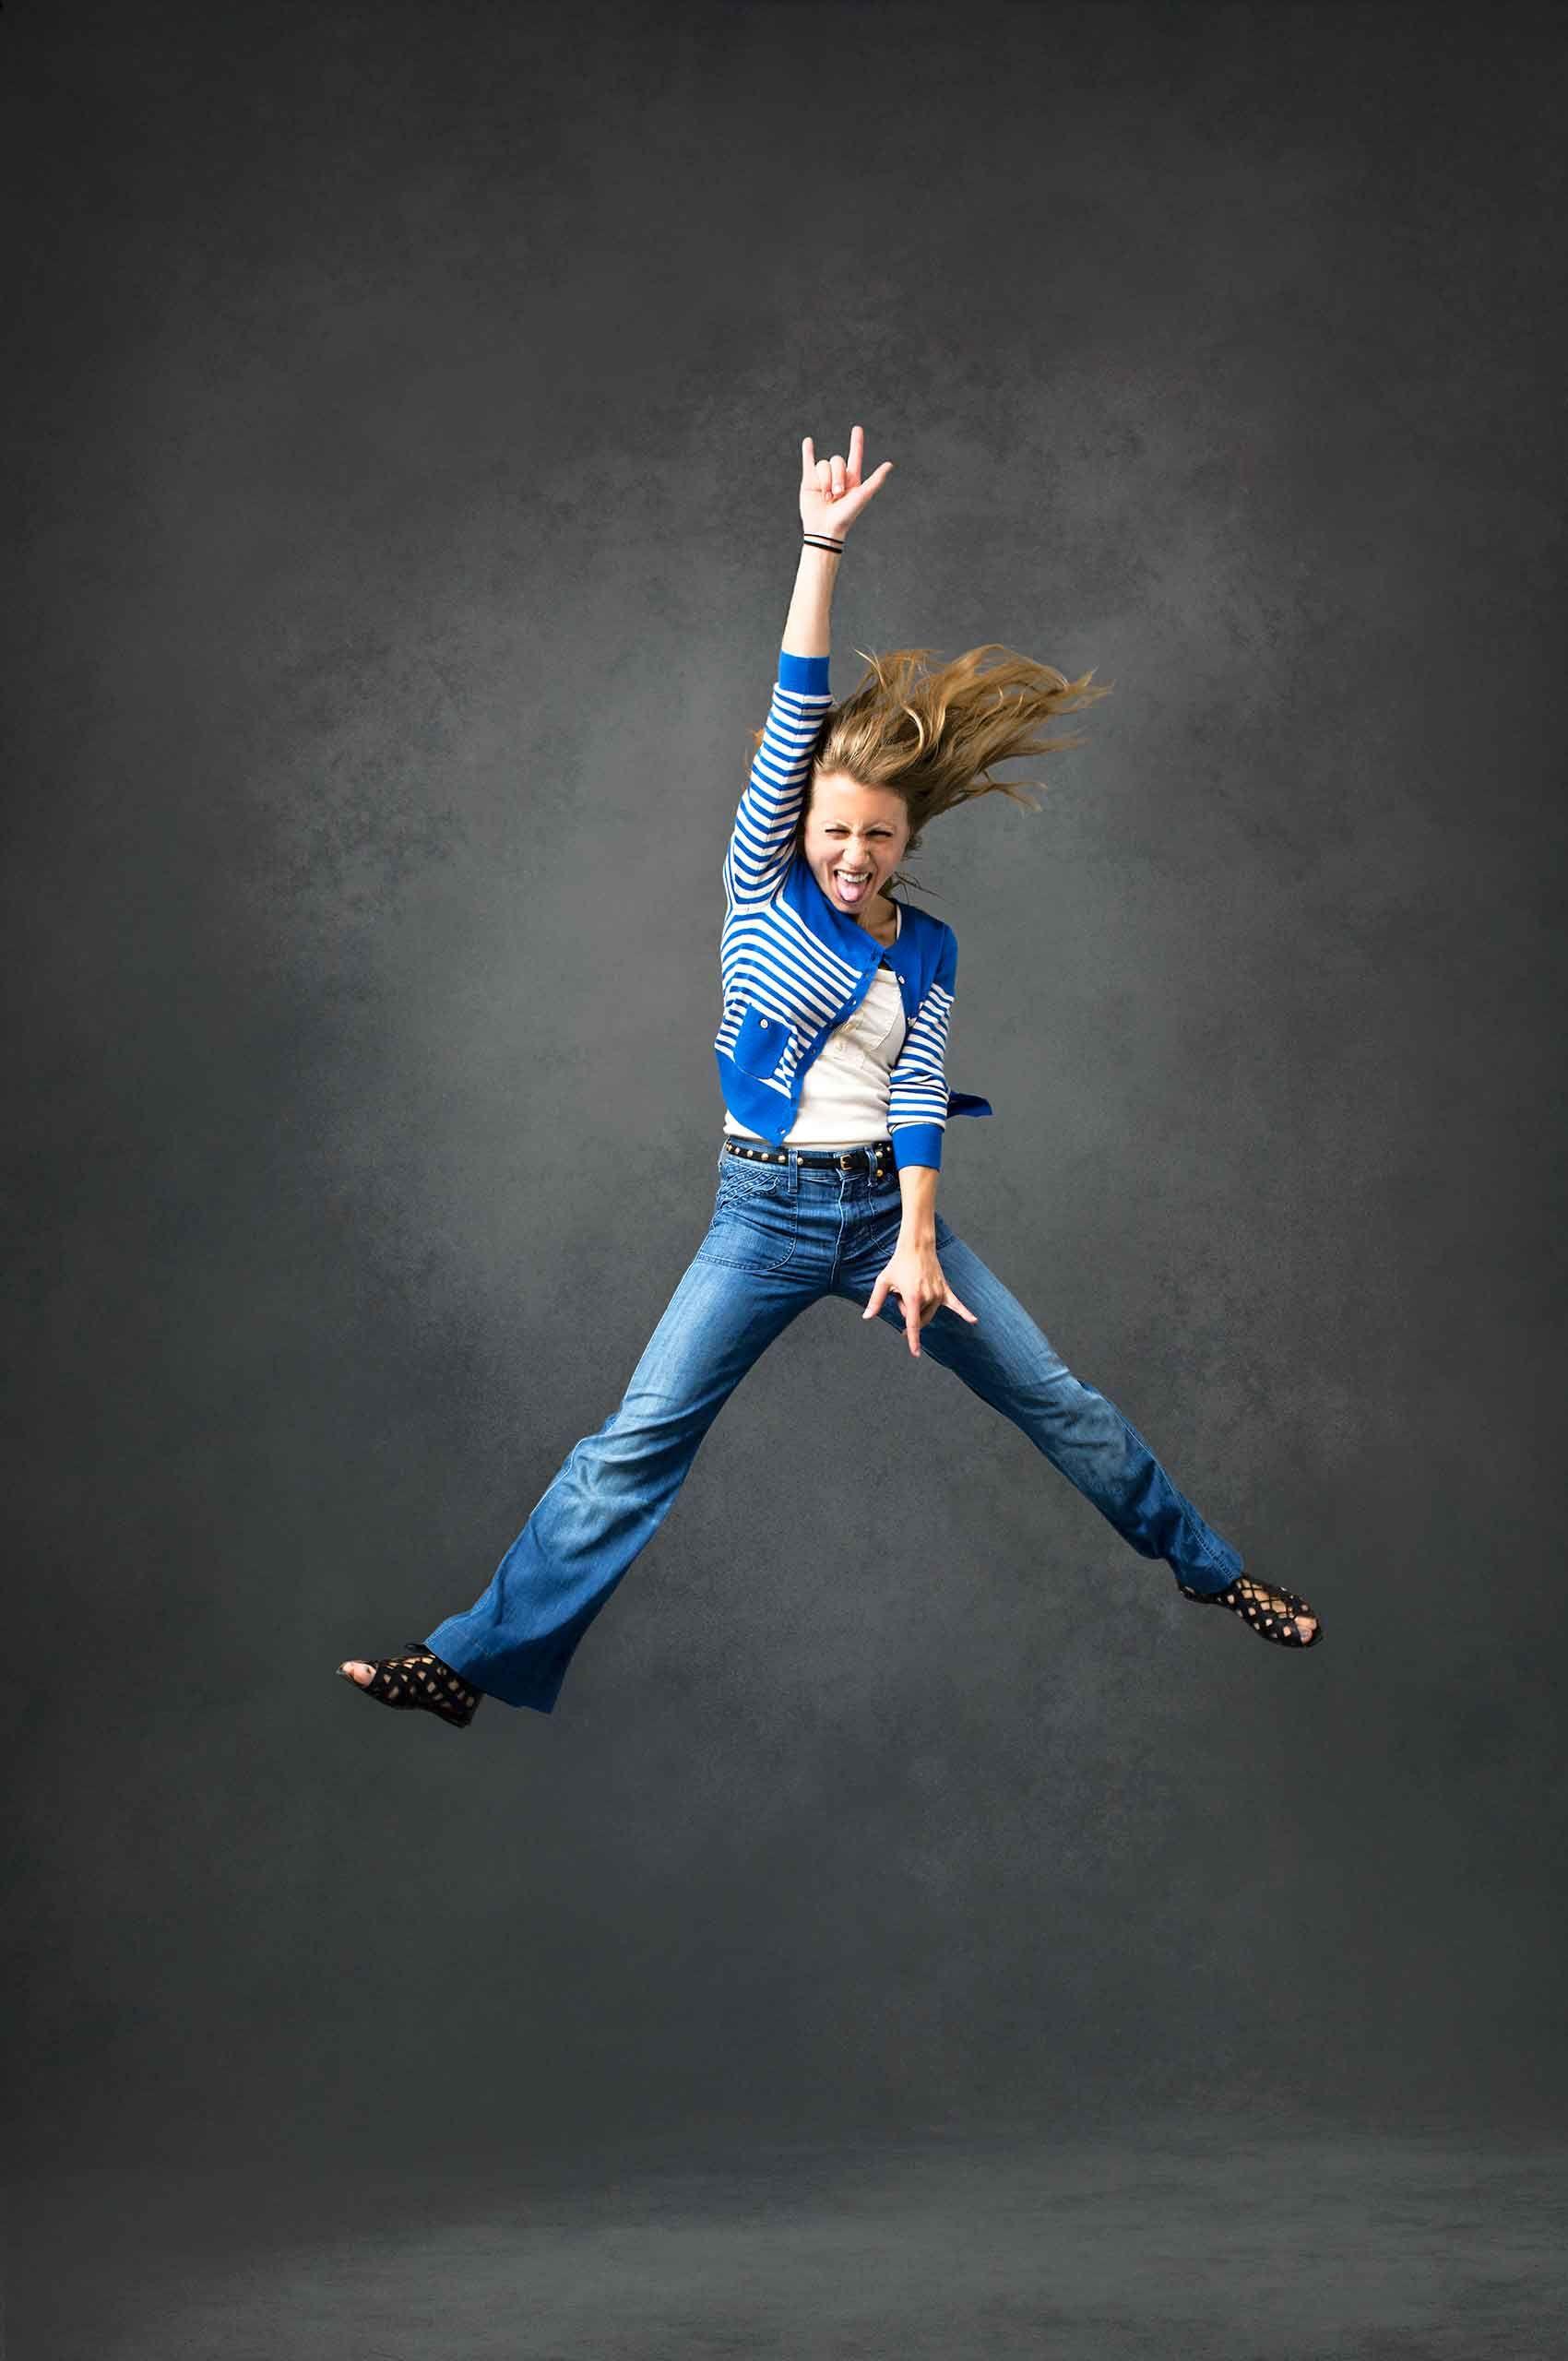 woman-jumping-HenrikOlundPhotography.jpg